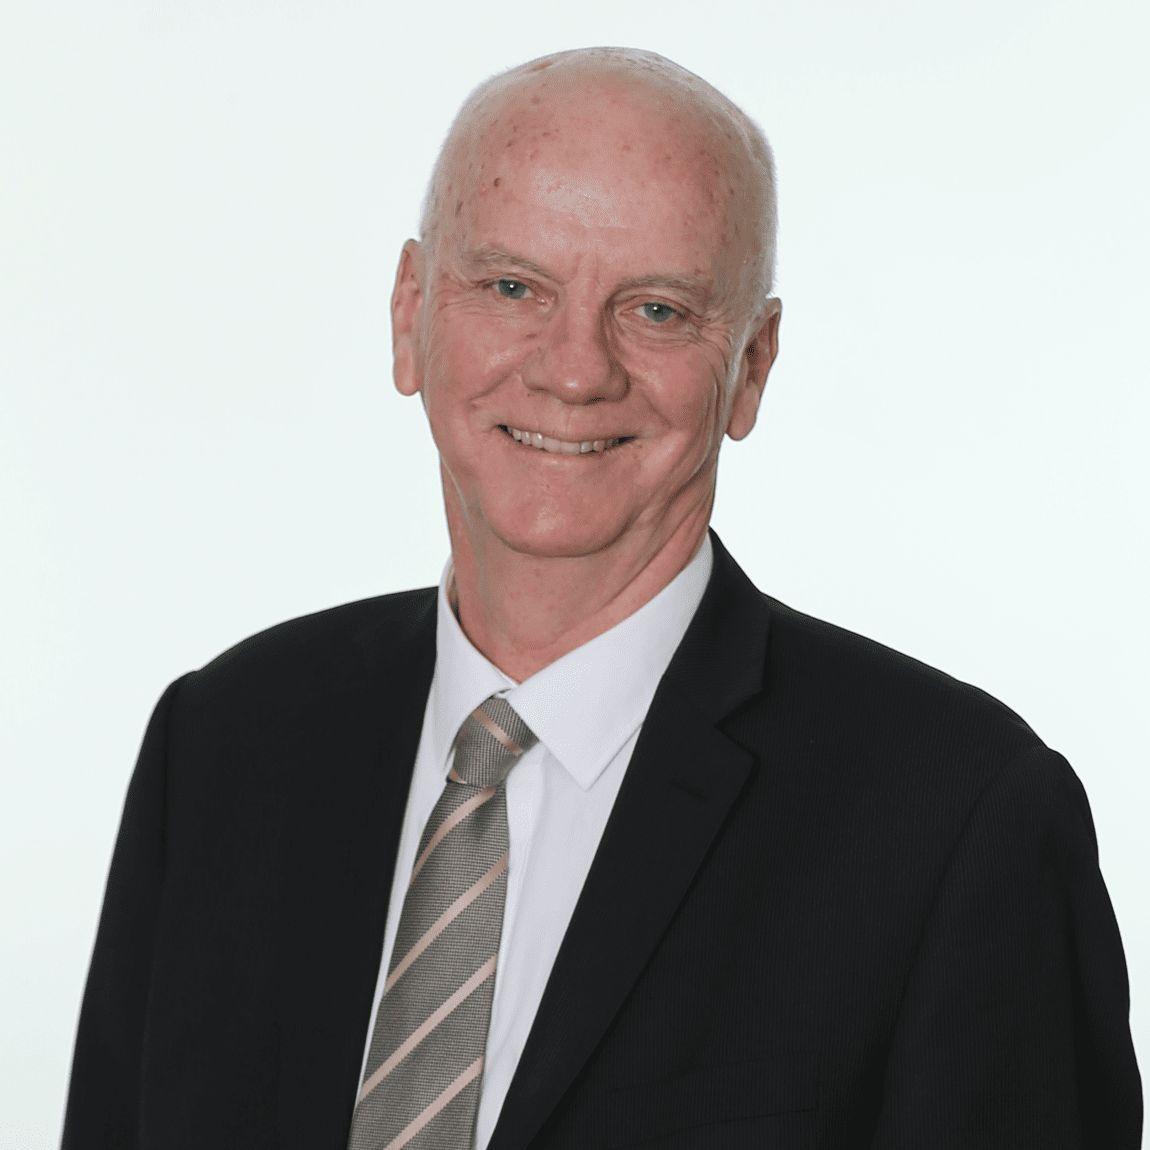 Paul Lahiff